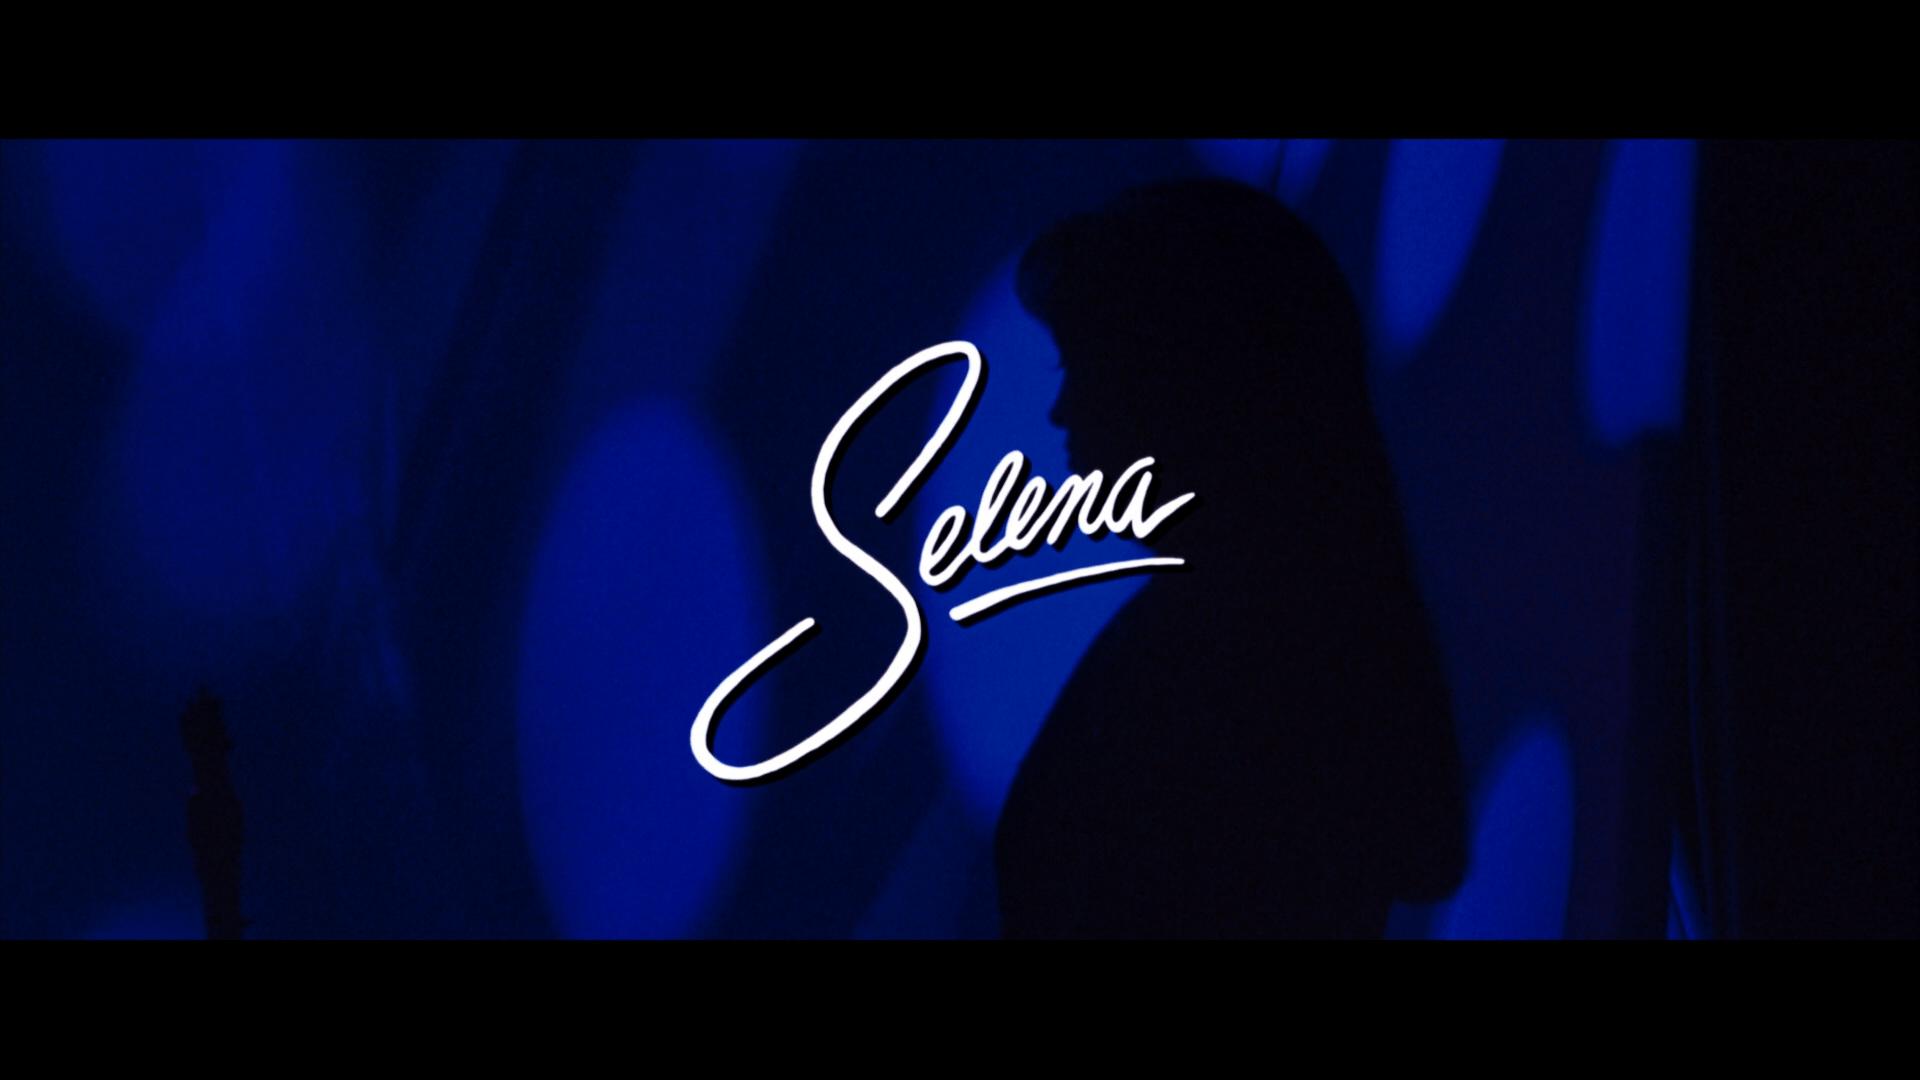 selena warner archive blu-ray movie title